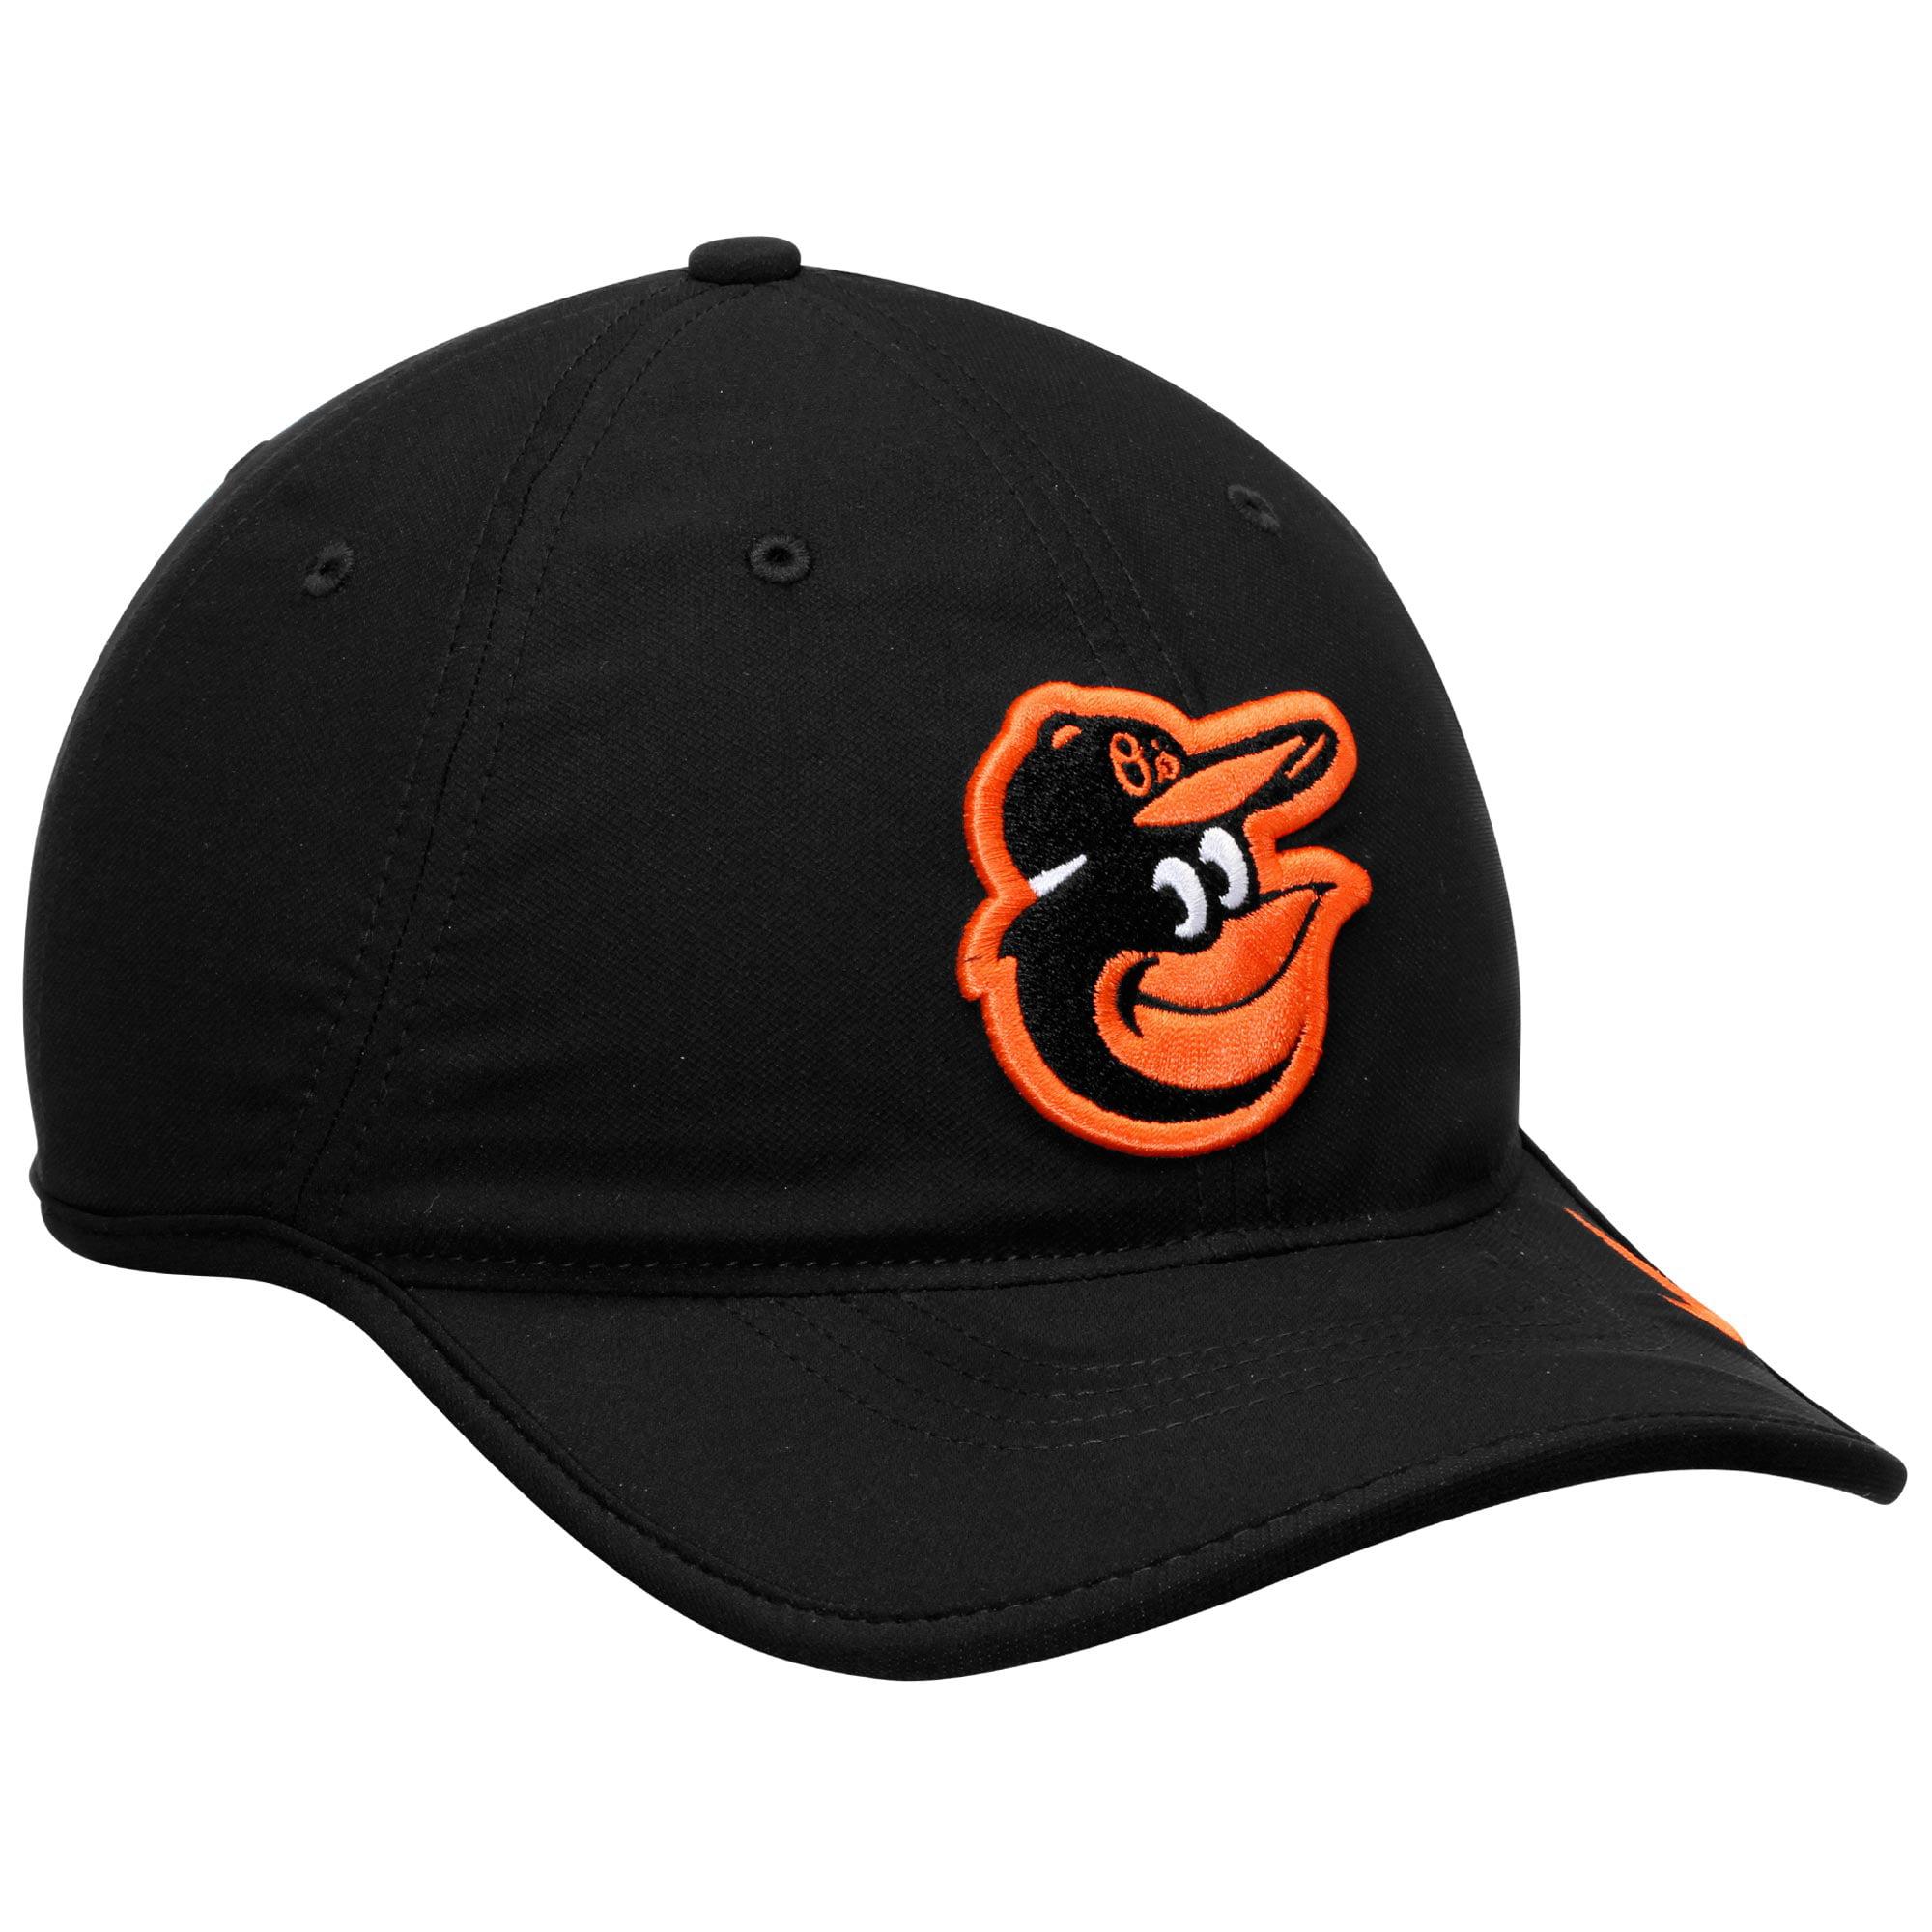 cd593a6f5326b Baltimore Orioles Nike Team Logo Heritage 86 Aero Performance Adjustable Hat  - Black - OSFA - Walmart.com